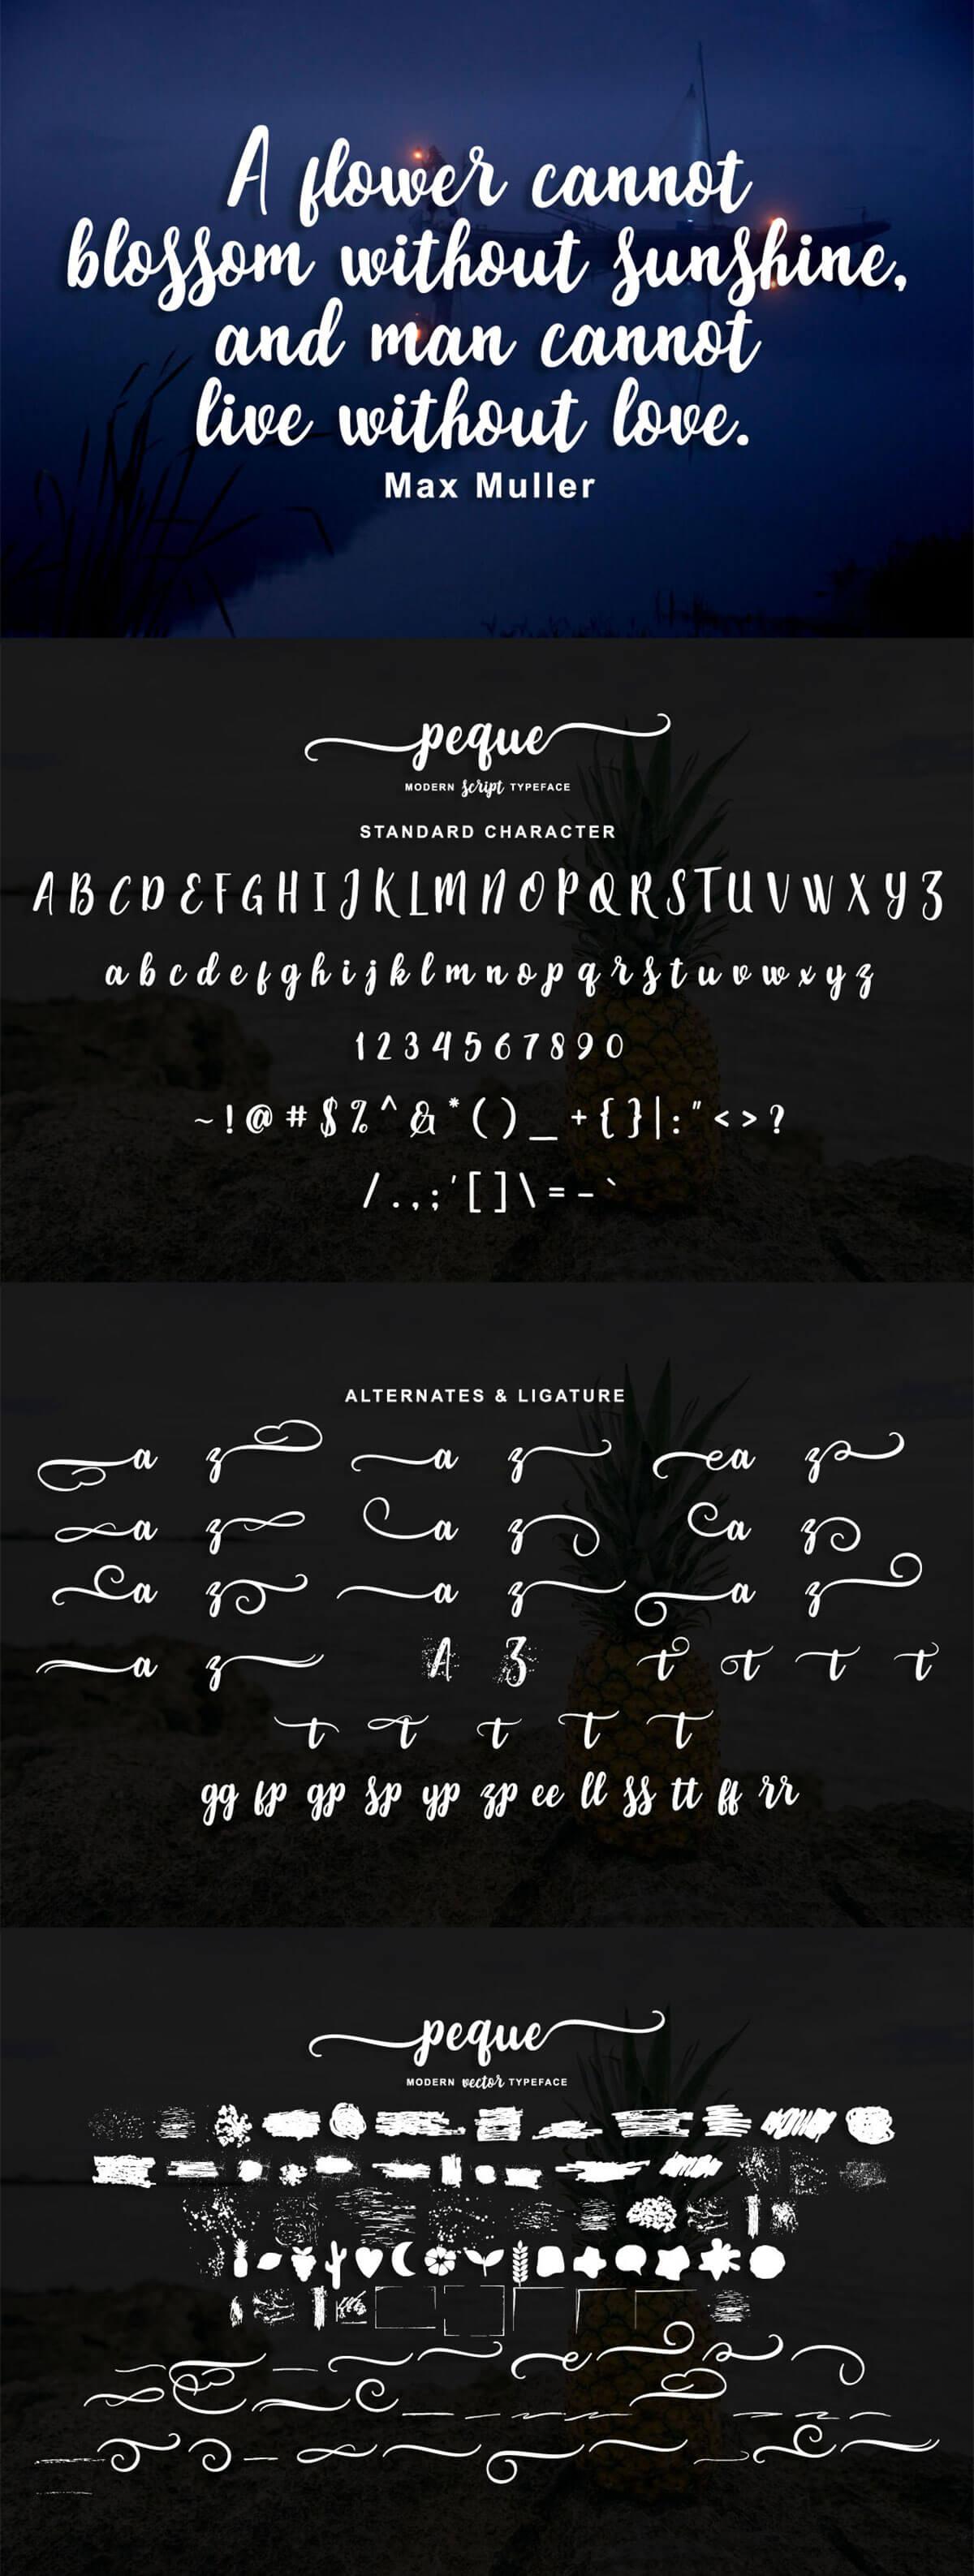 Free Peque Script Font